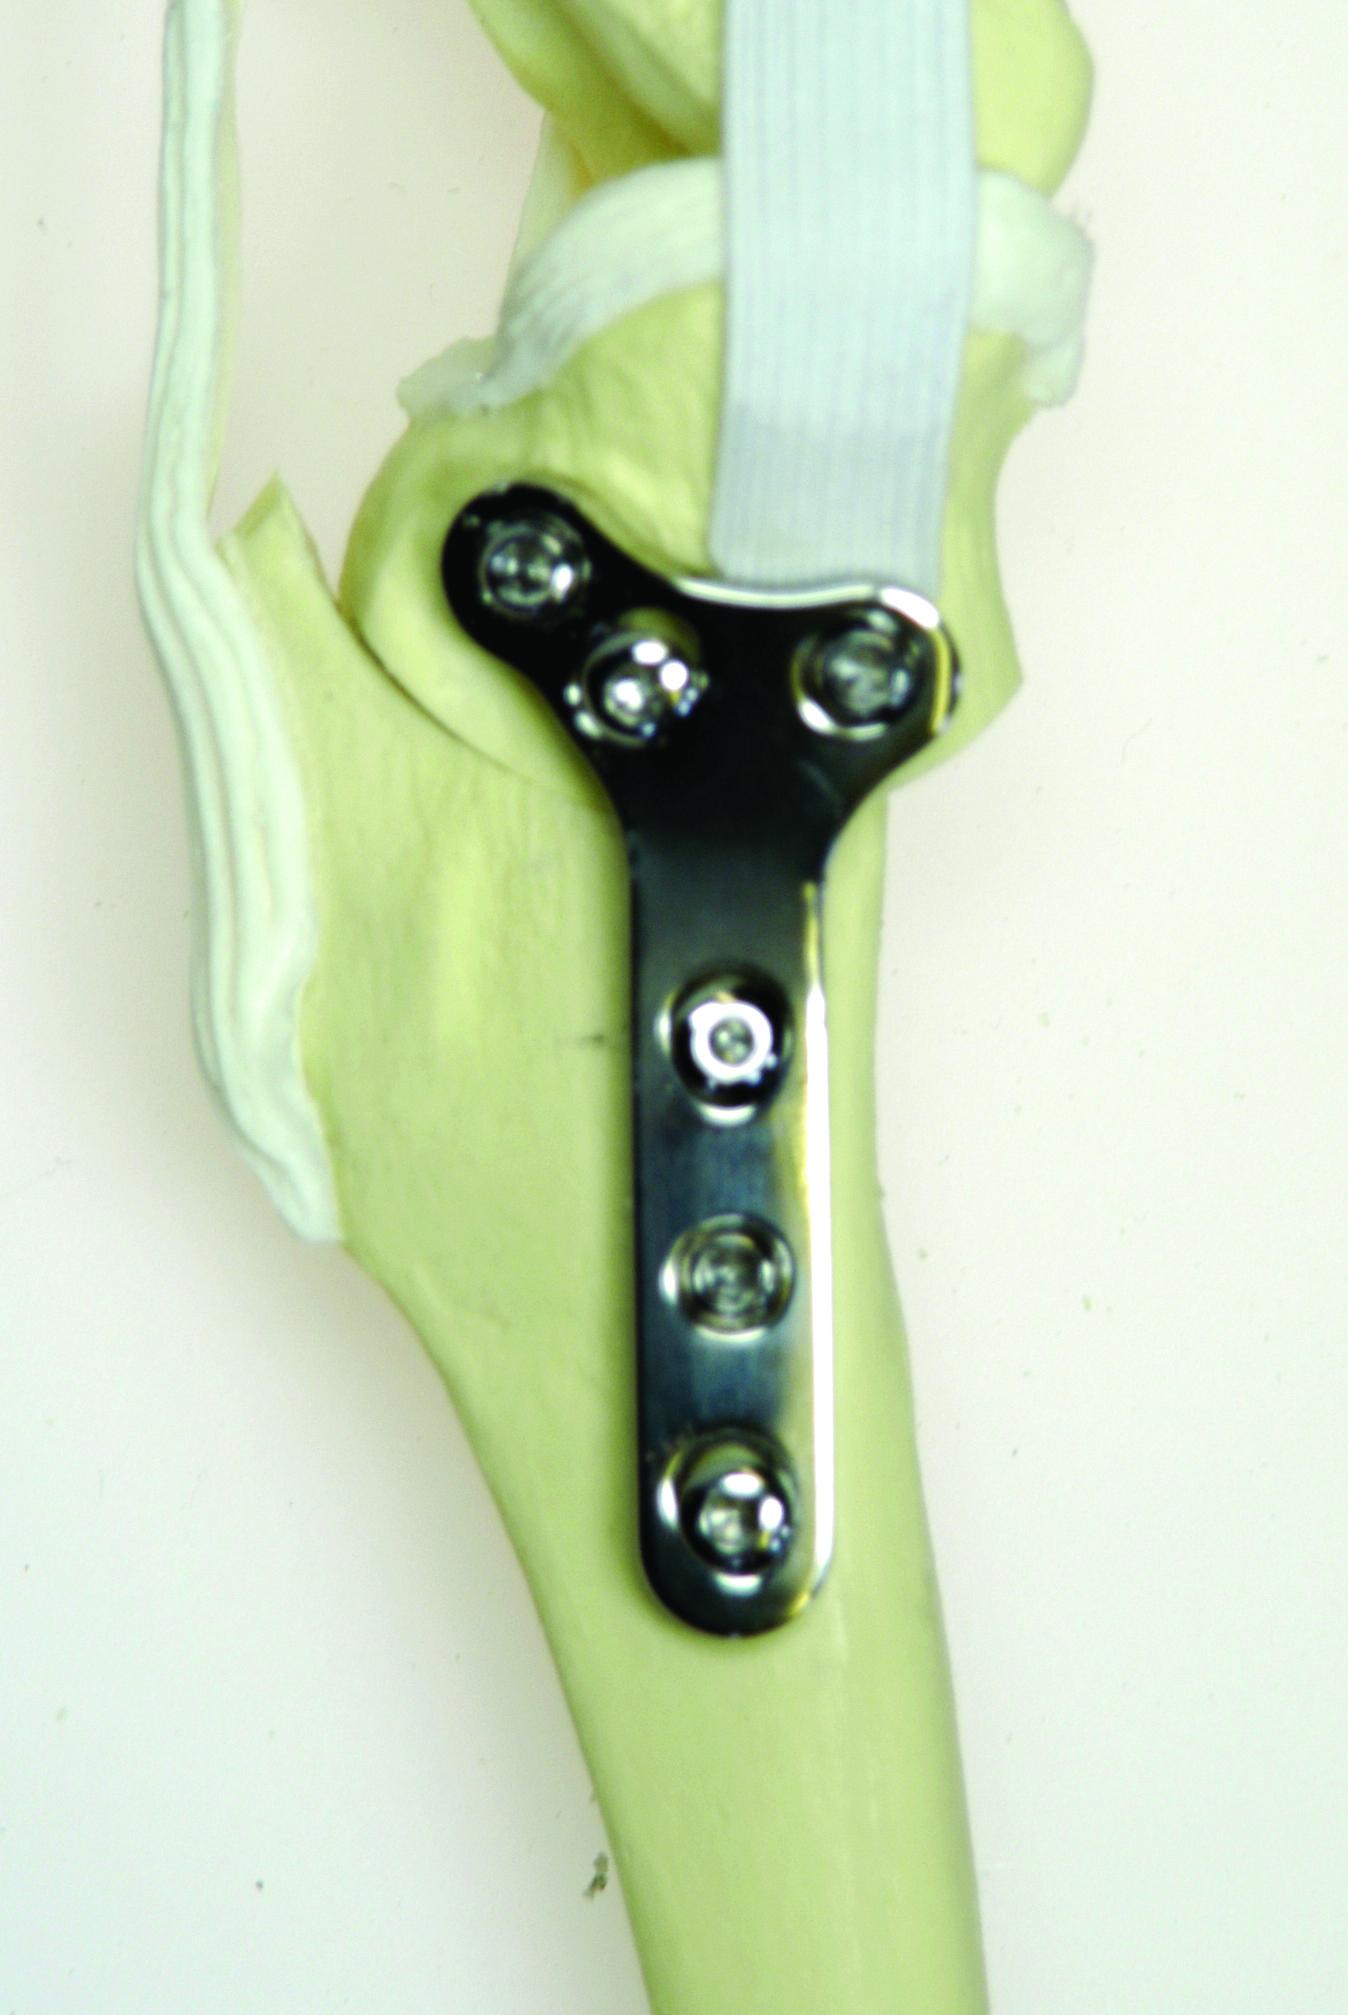 TPLO Plates with Locking Screws